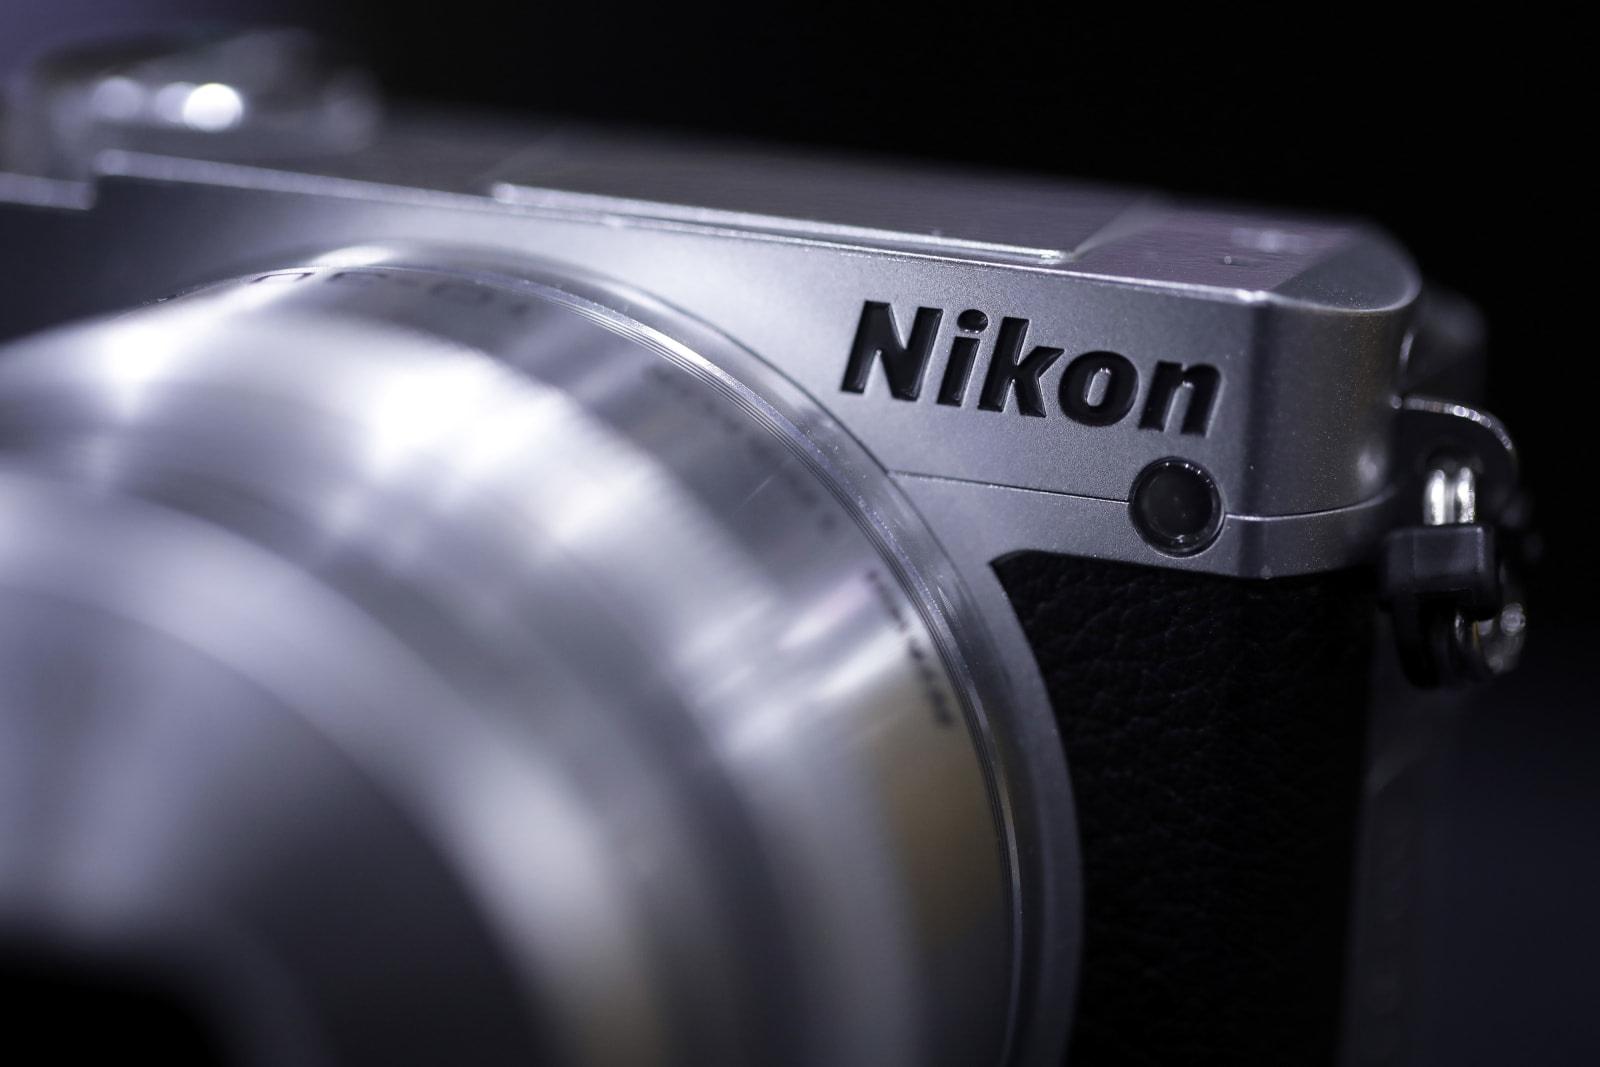 kiyoshi otabloomberg via getty images - Mirrorless Full Frame